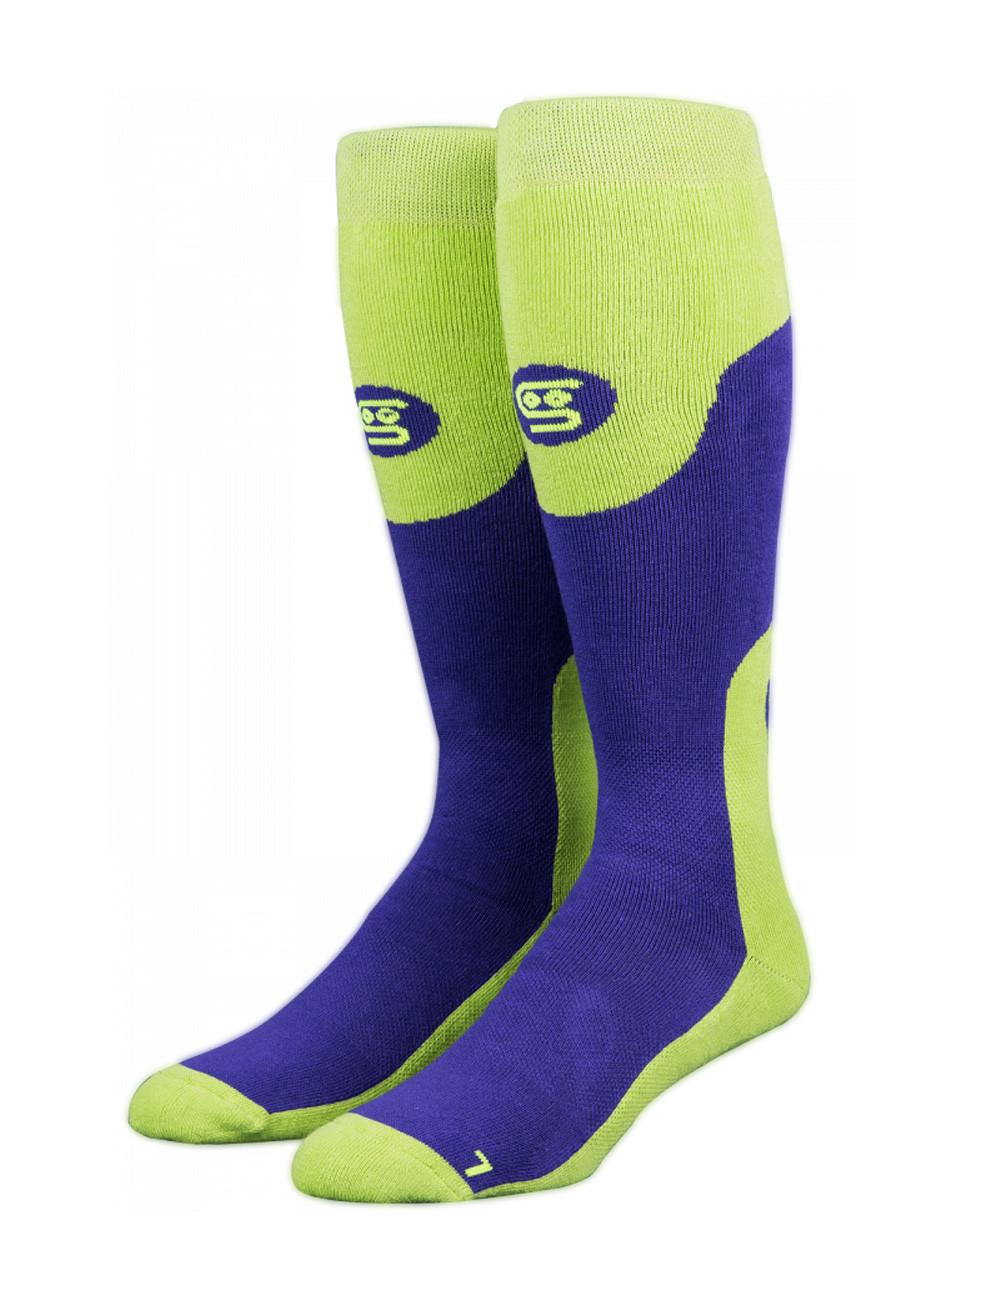 Skarpety Stinky Socks Purple Haze